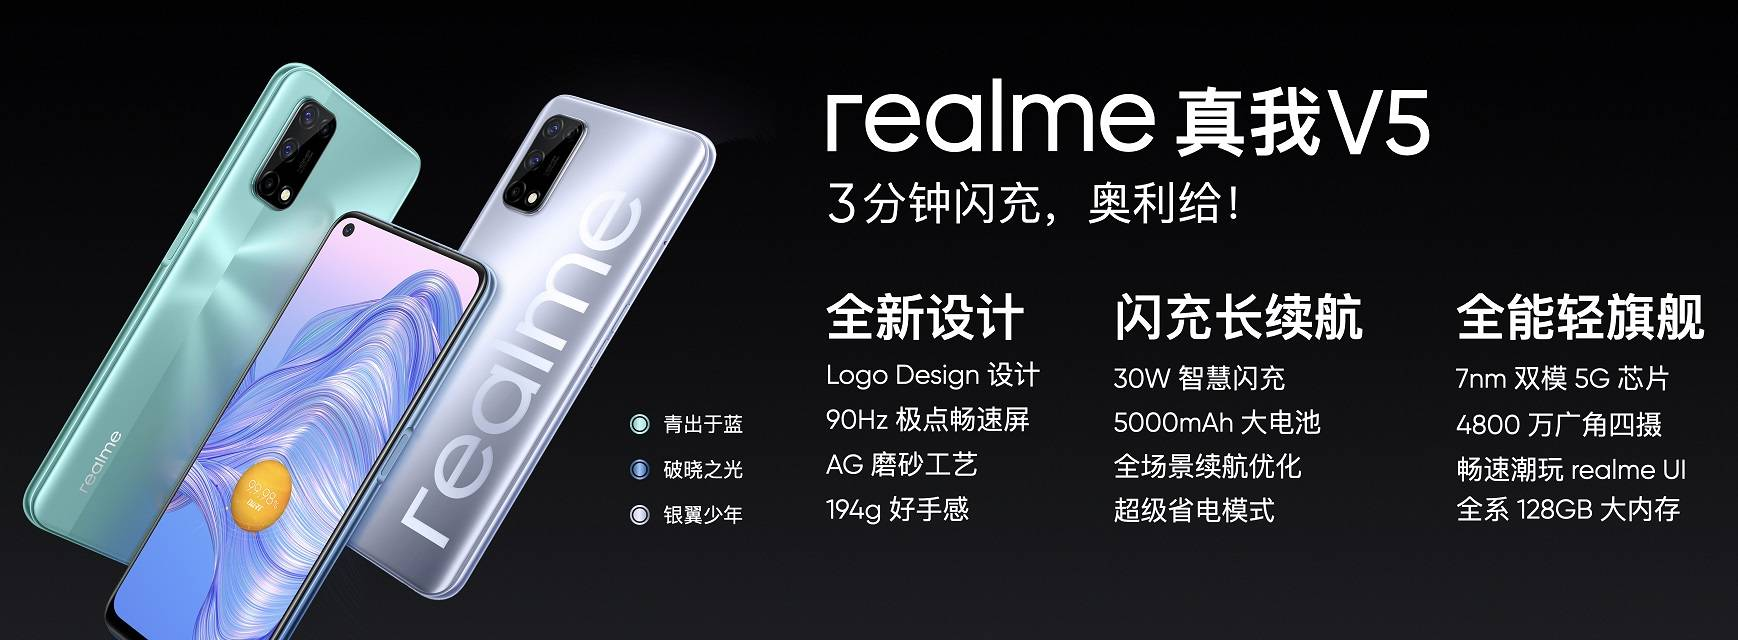 realme真我V5发布:天玑720+30W闪充,主打潮玩设计和品质